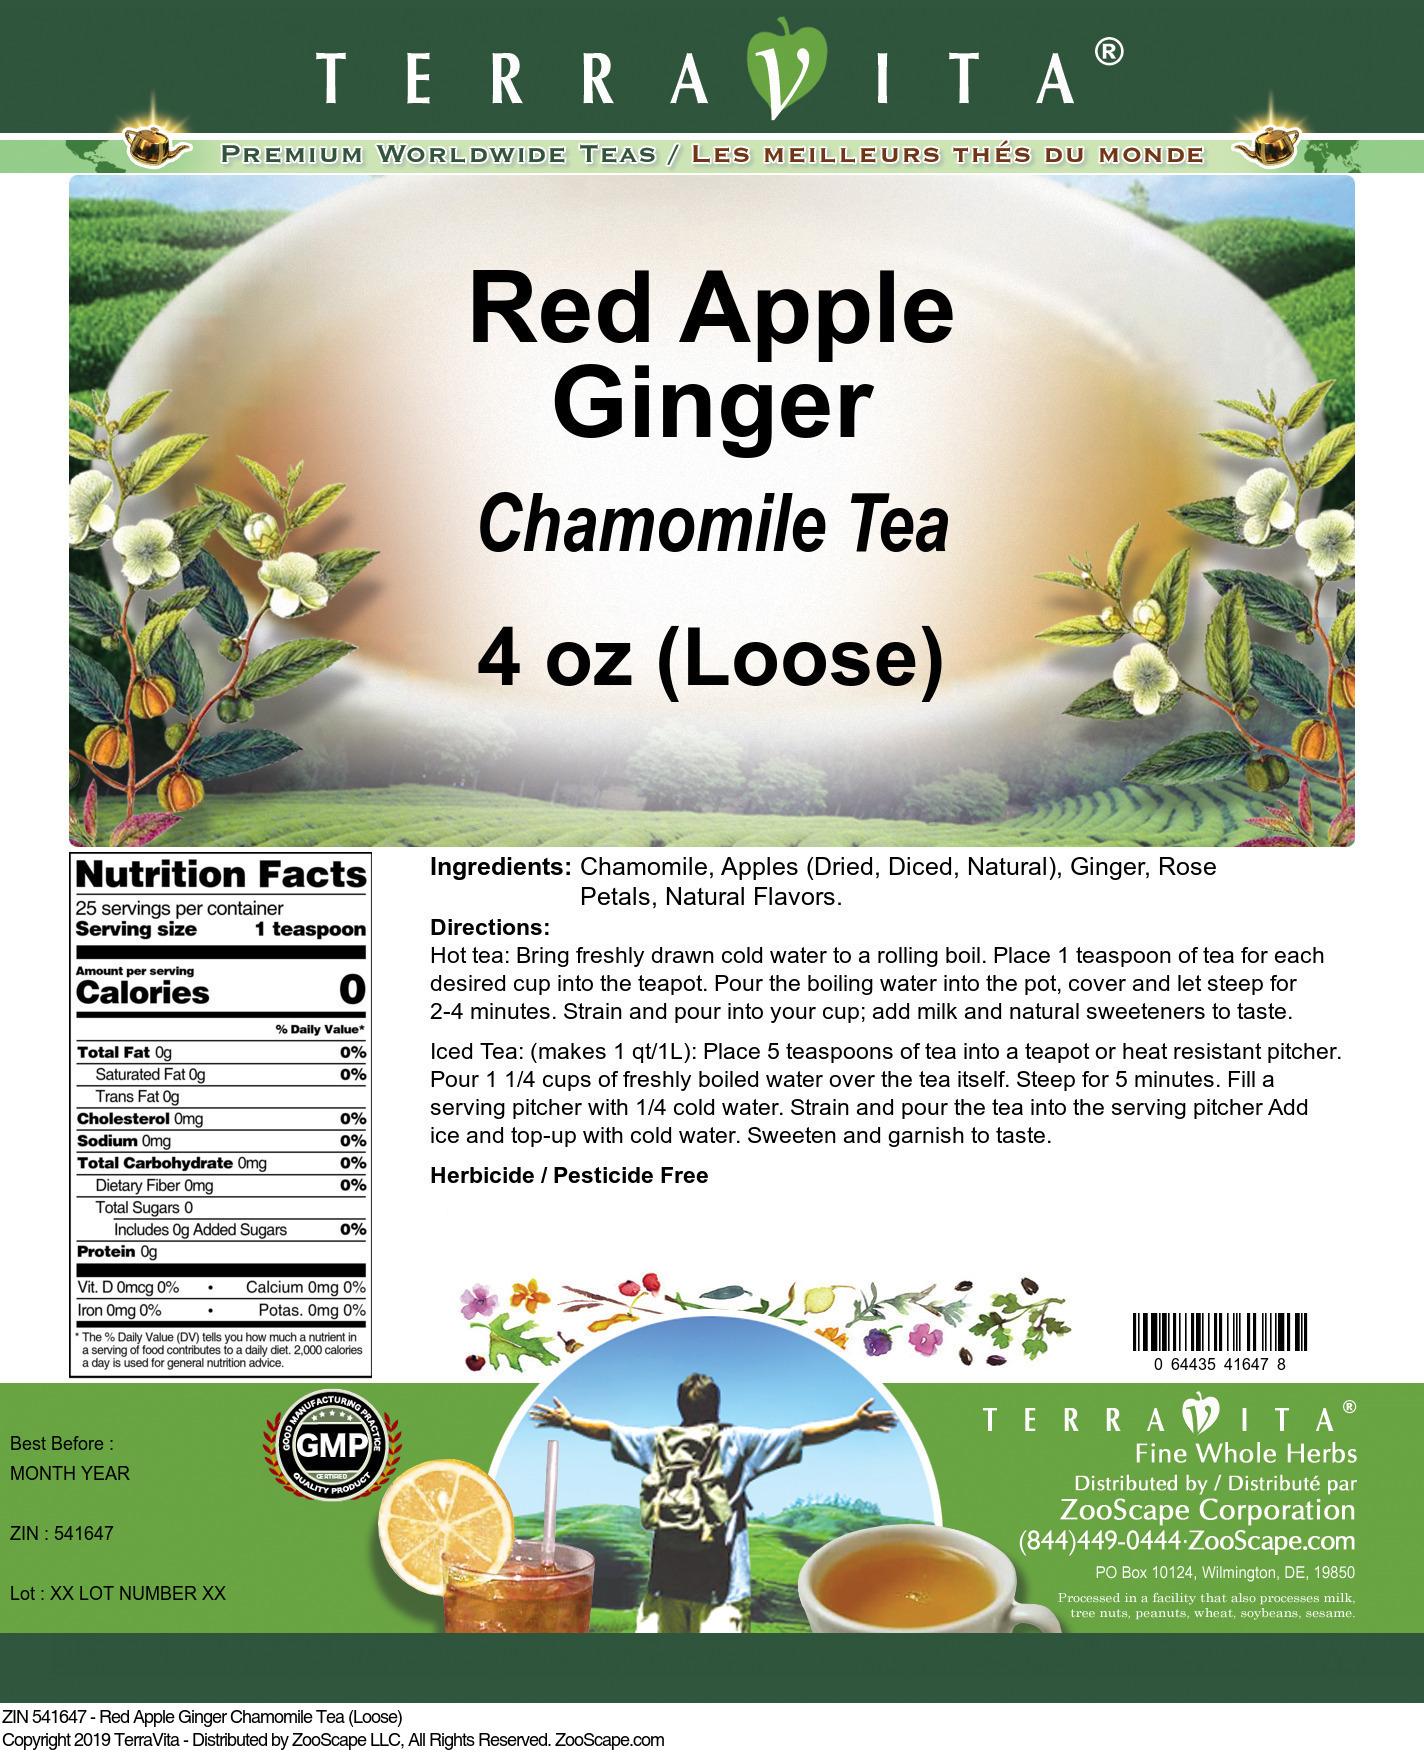 Red Apple Ginger Chamomile Tea (Loose)